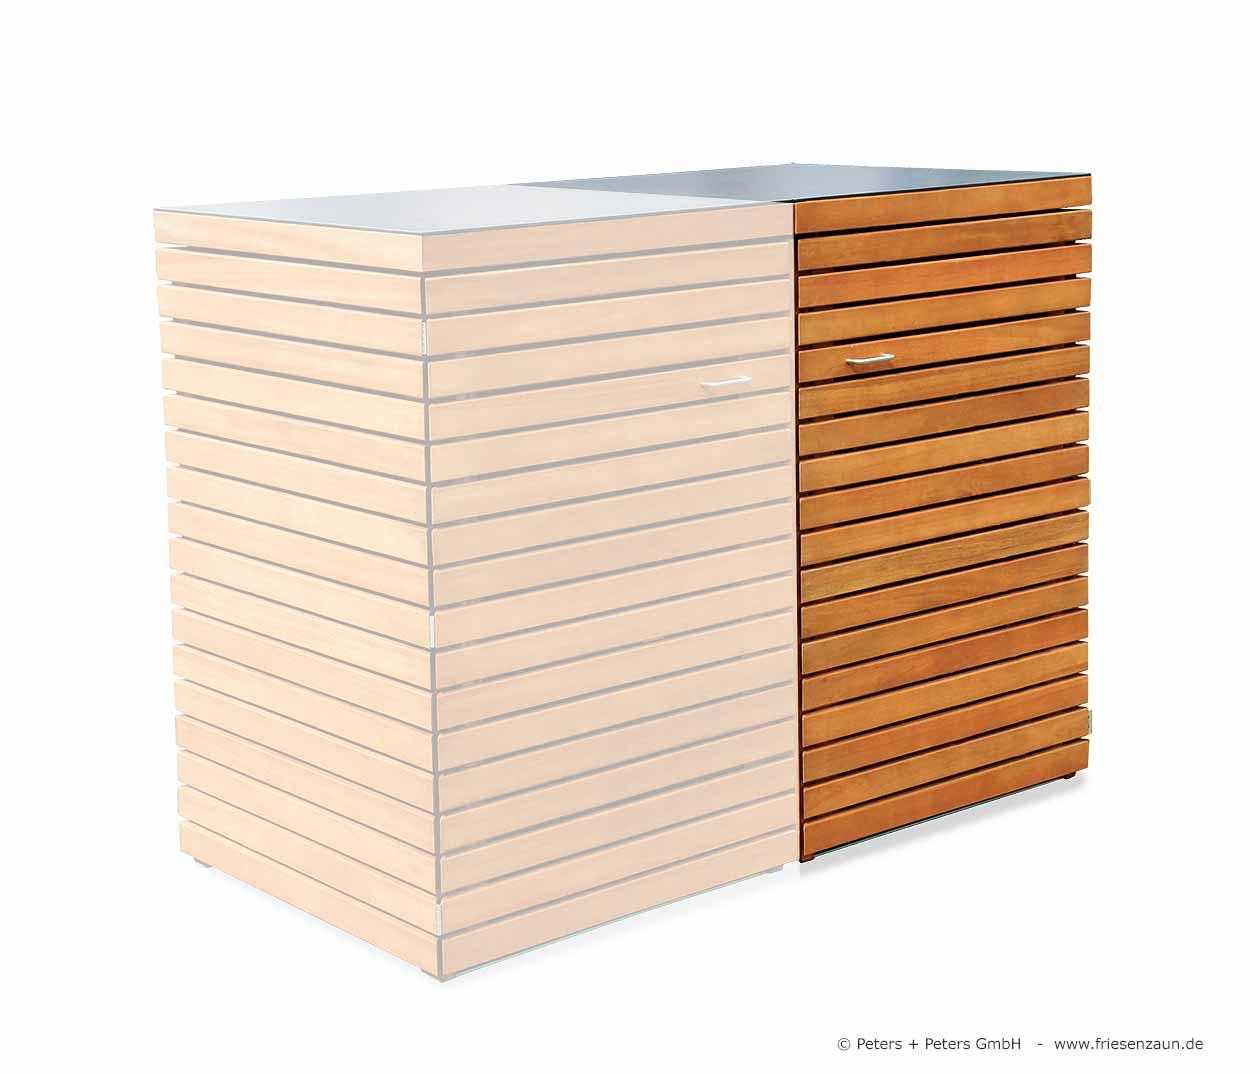 friesenbank-shop - 6er mülltonnenbox 240 - astfreies hartholz geölt